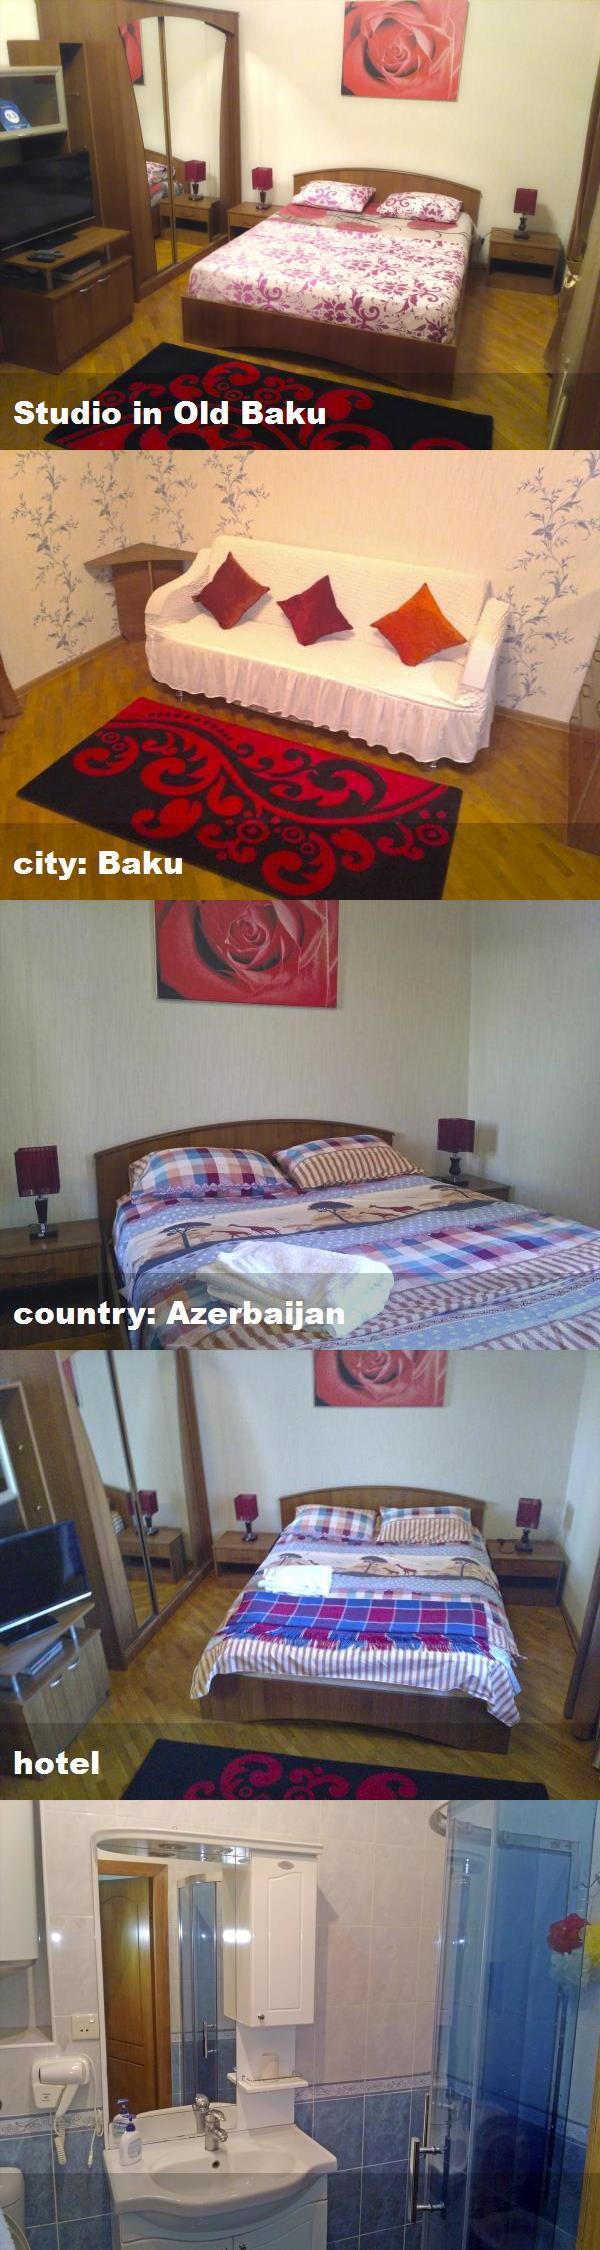 Studio In Old Baku City Baku Country Azerbaijan Hotel Azerbaijan Hotel Baku City